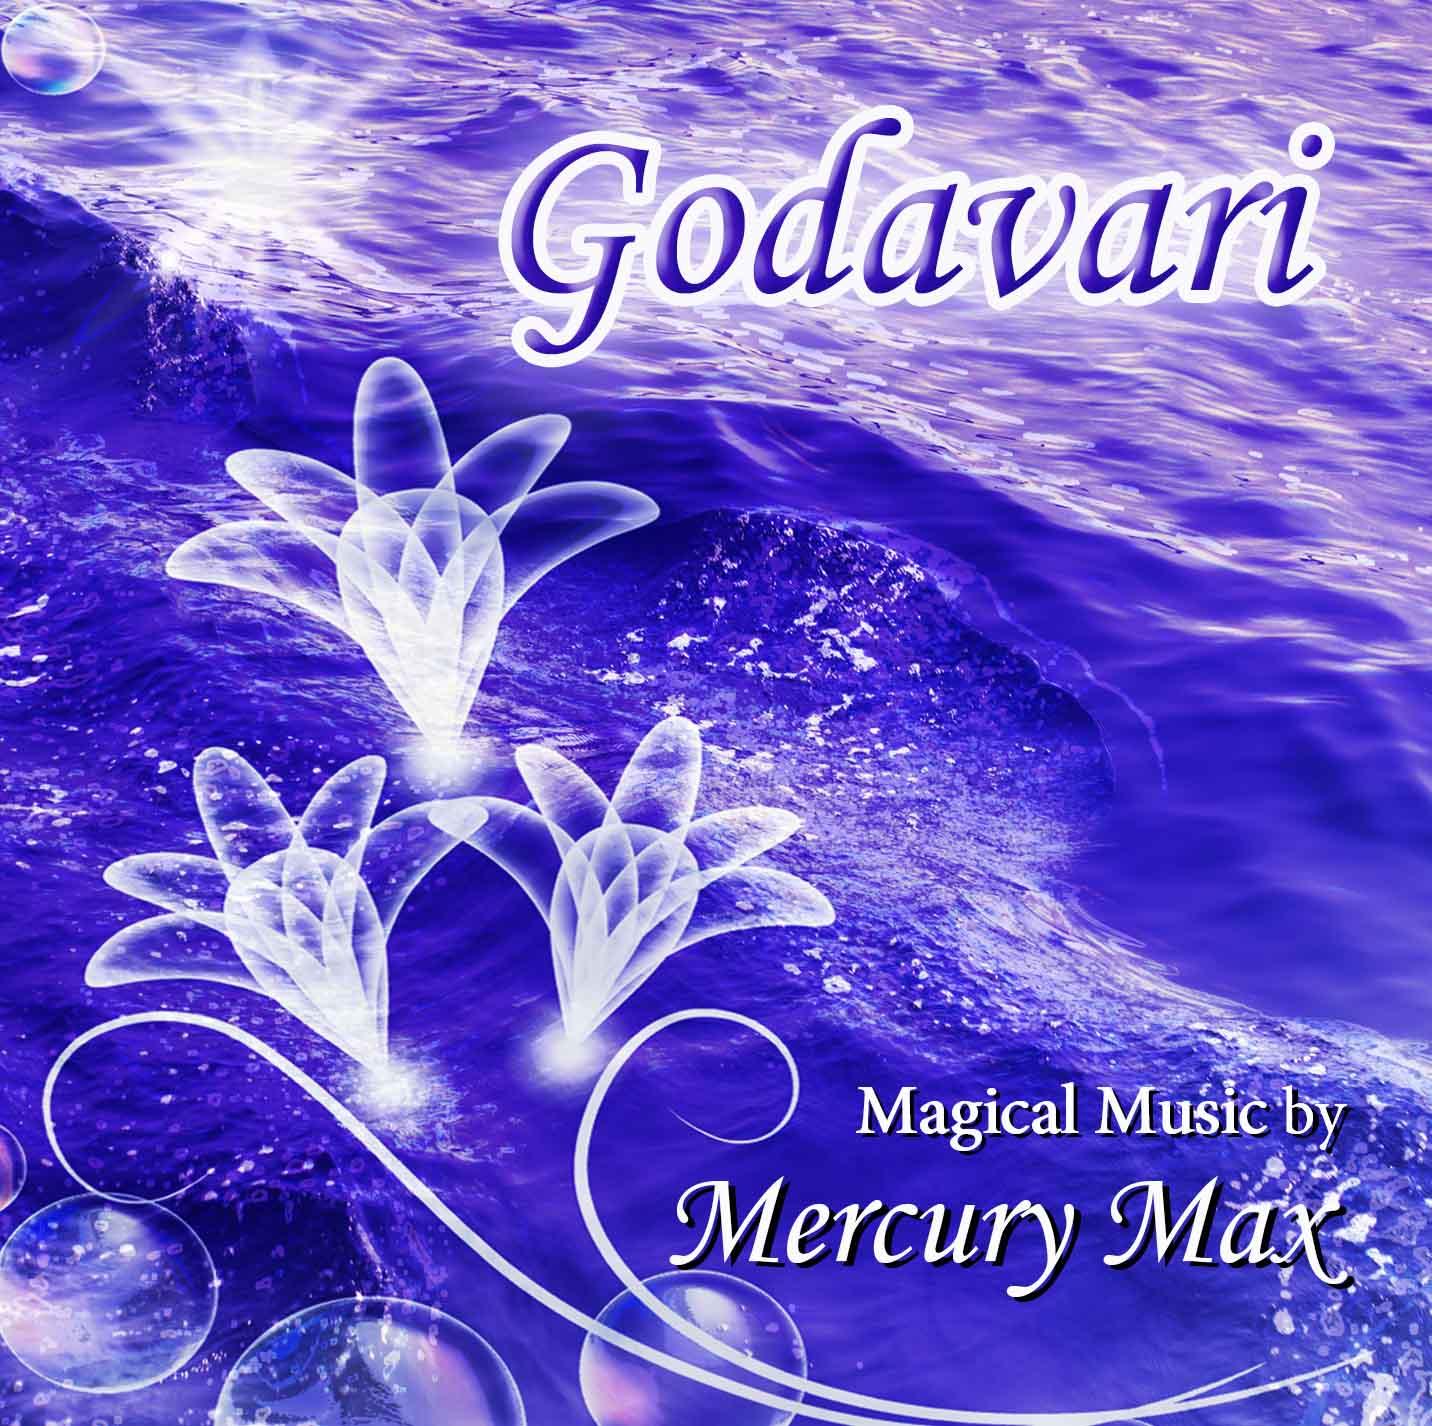 Godavari CD by Mercury Max